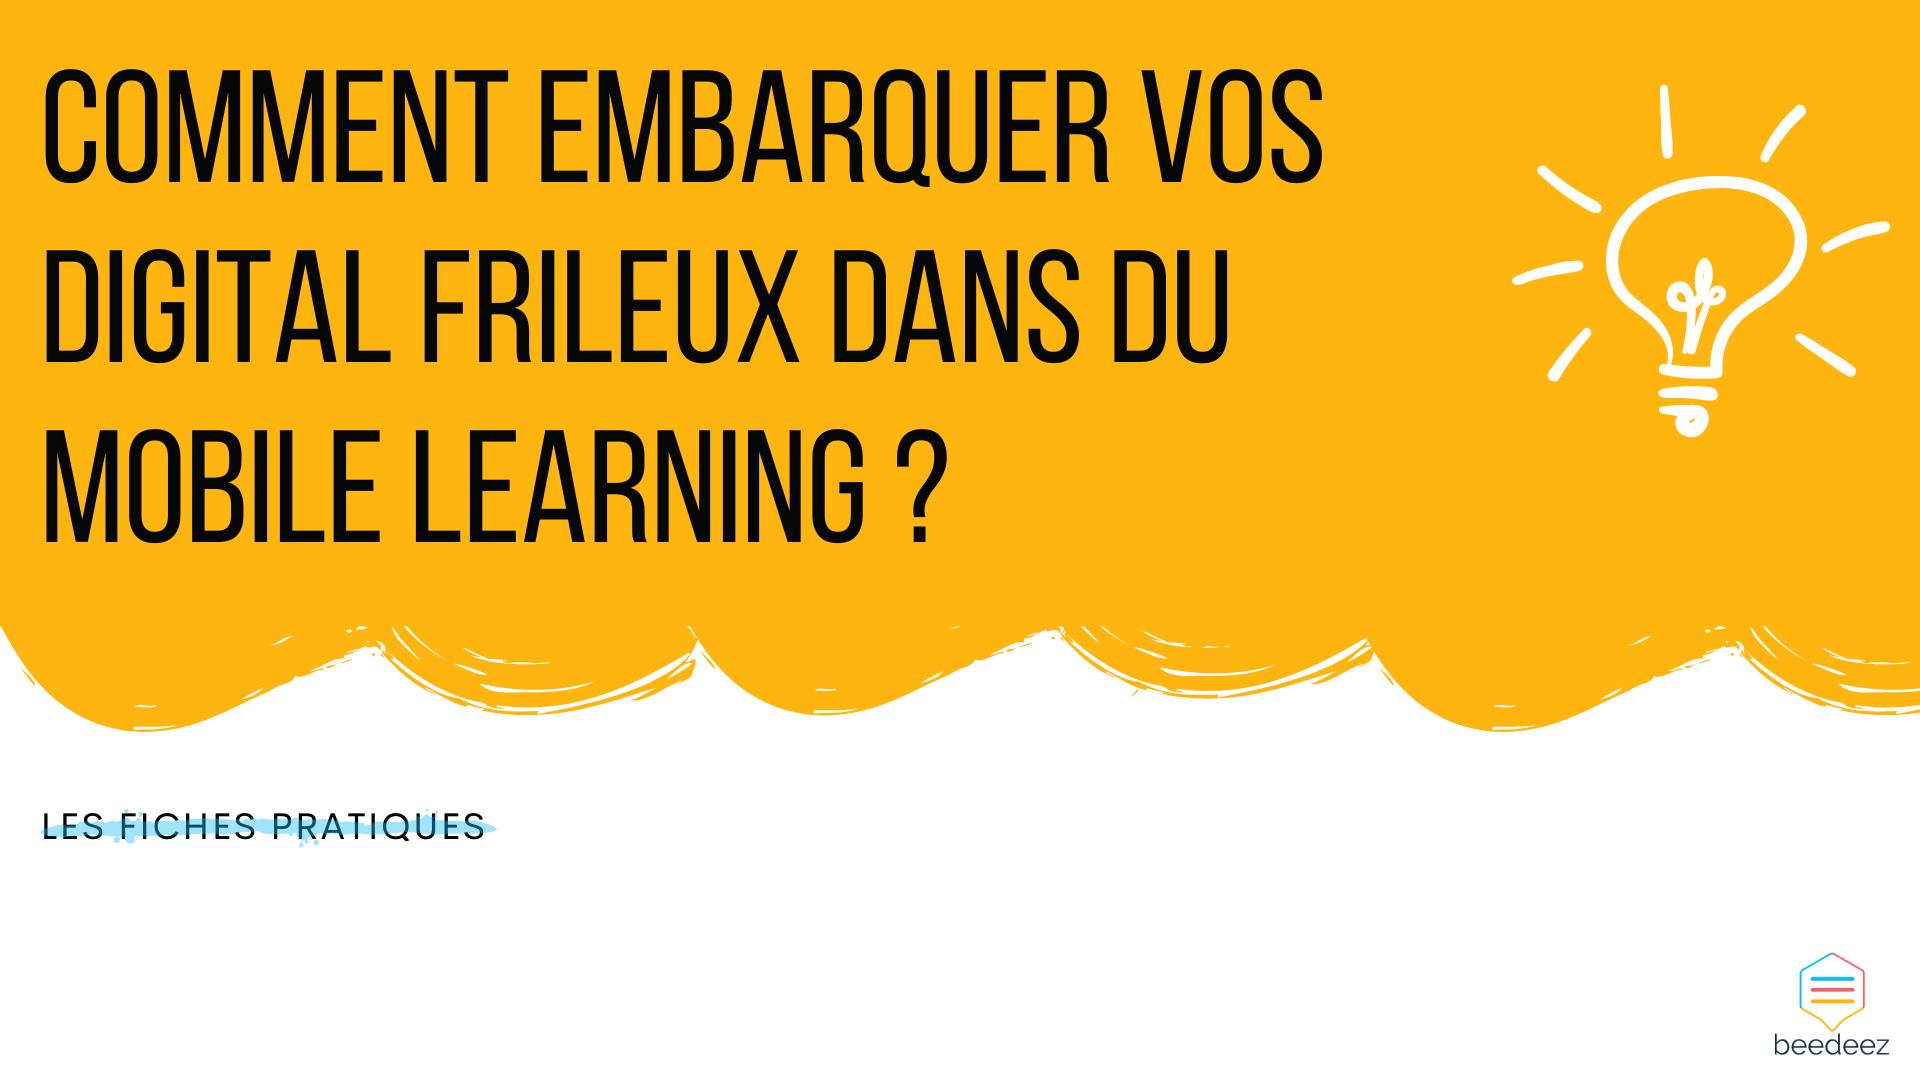 Comment embarquer vos digital frileux dans du Mobile Learning ?